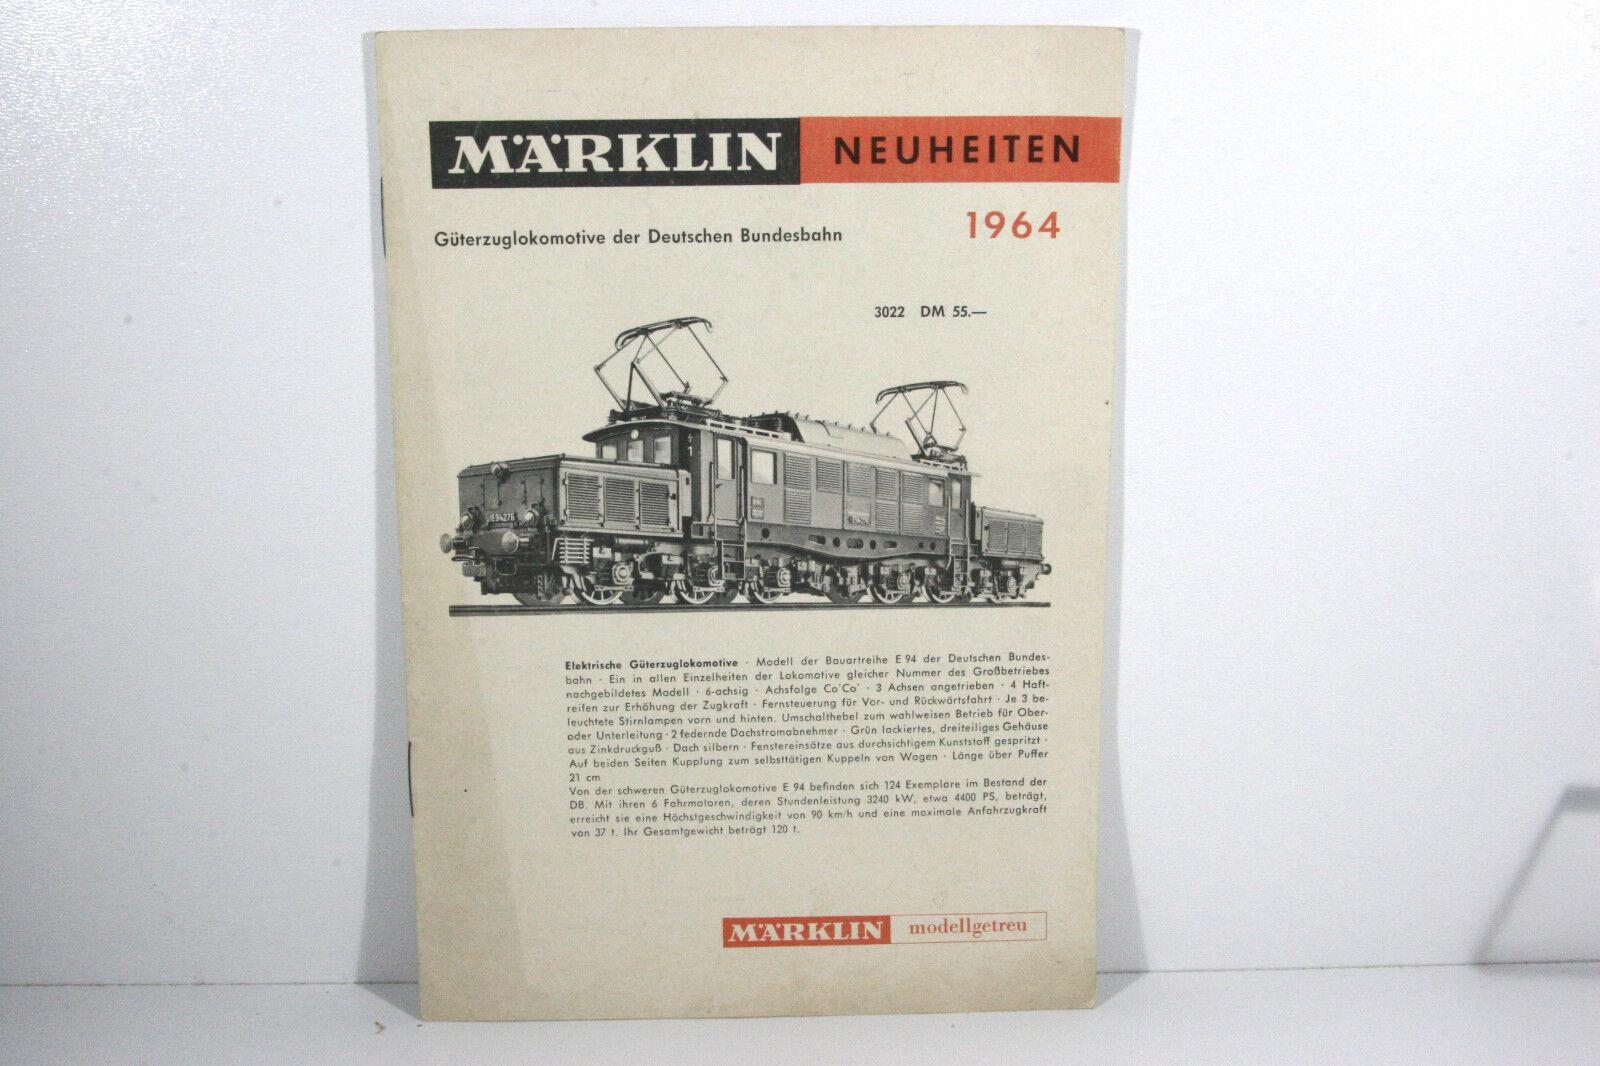 Märklin News Journal 1964, with Accessory, Beautiful